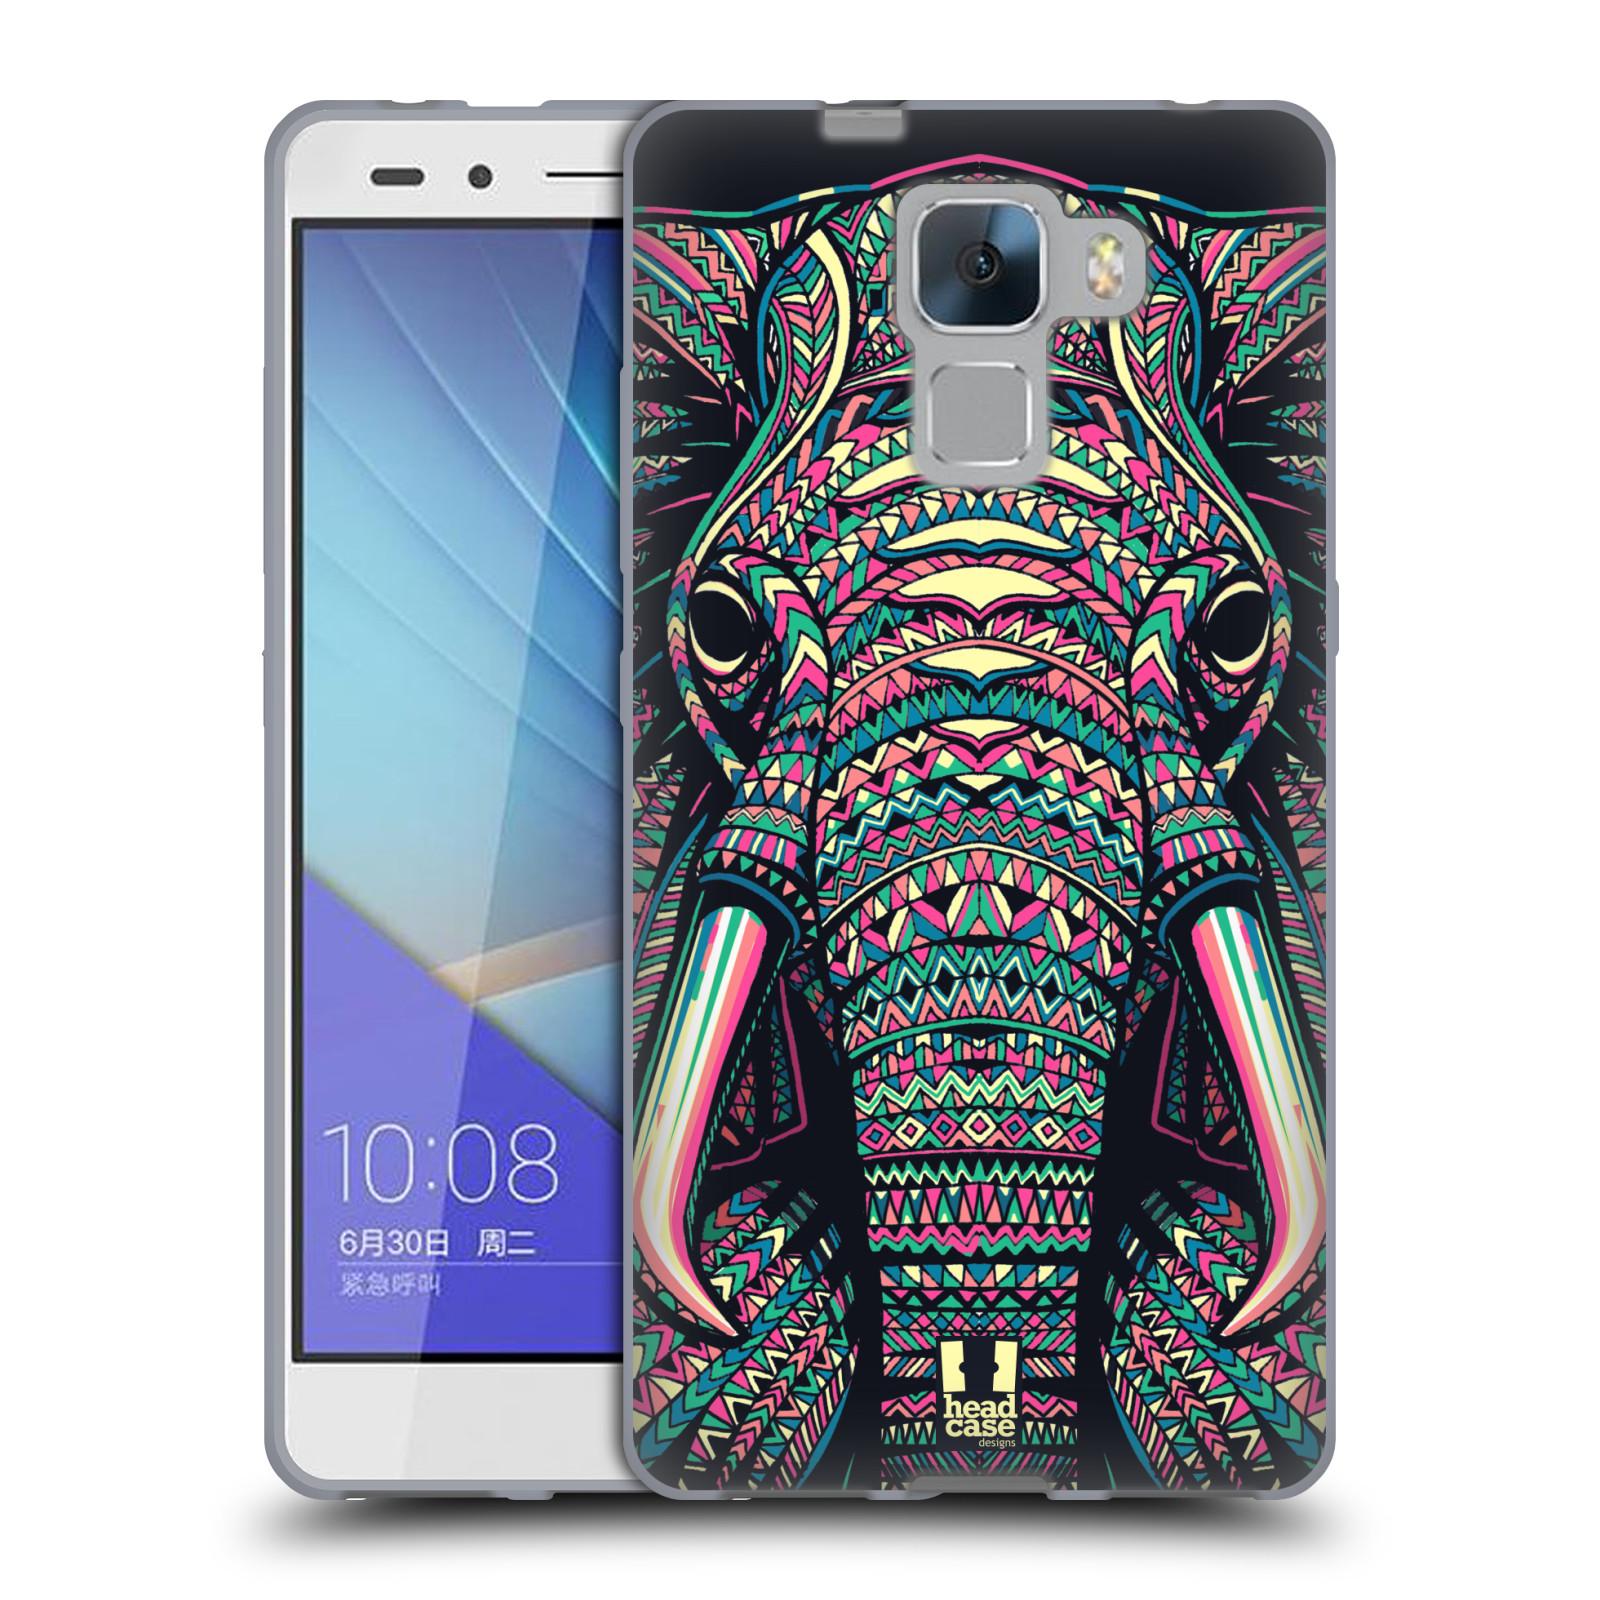 Silikonové pouzdro na mobil Honor 7 HEAD CASE AZTEC SLON